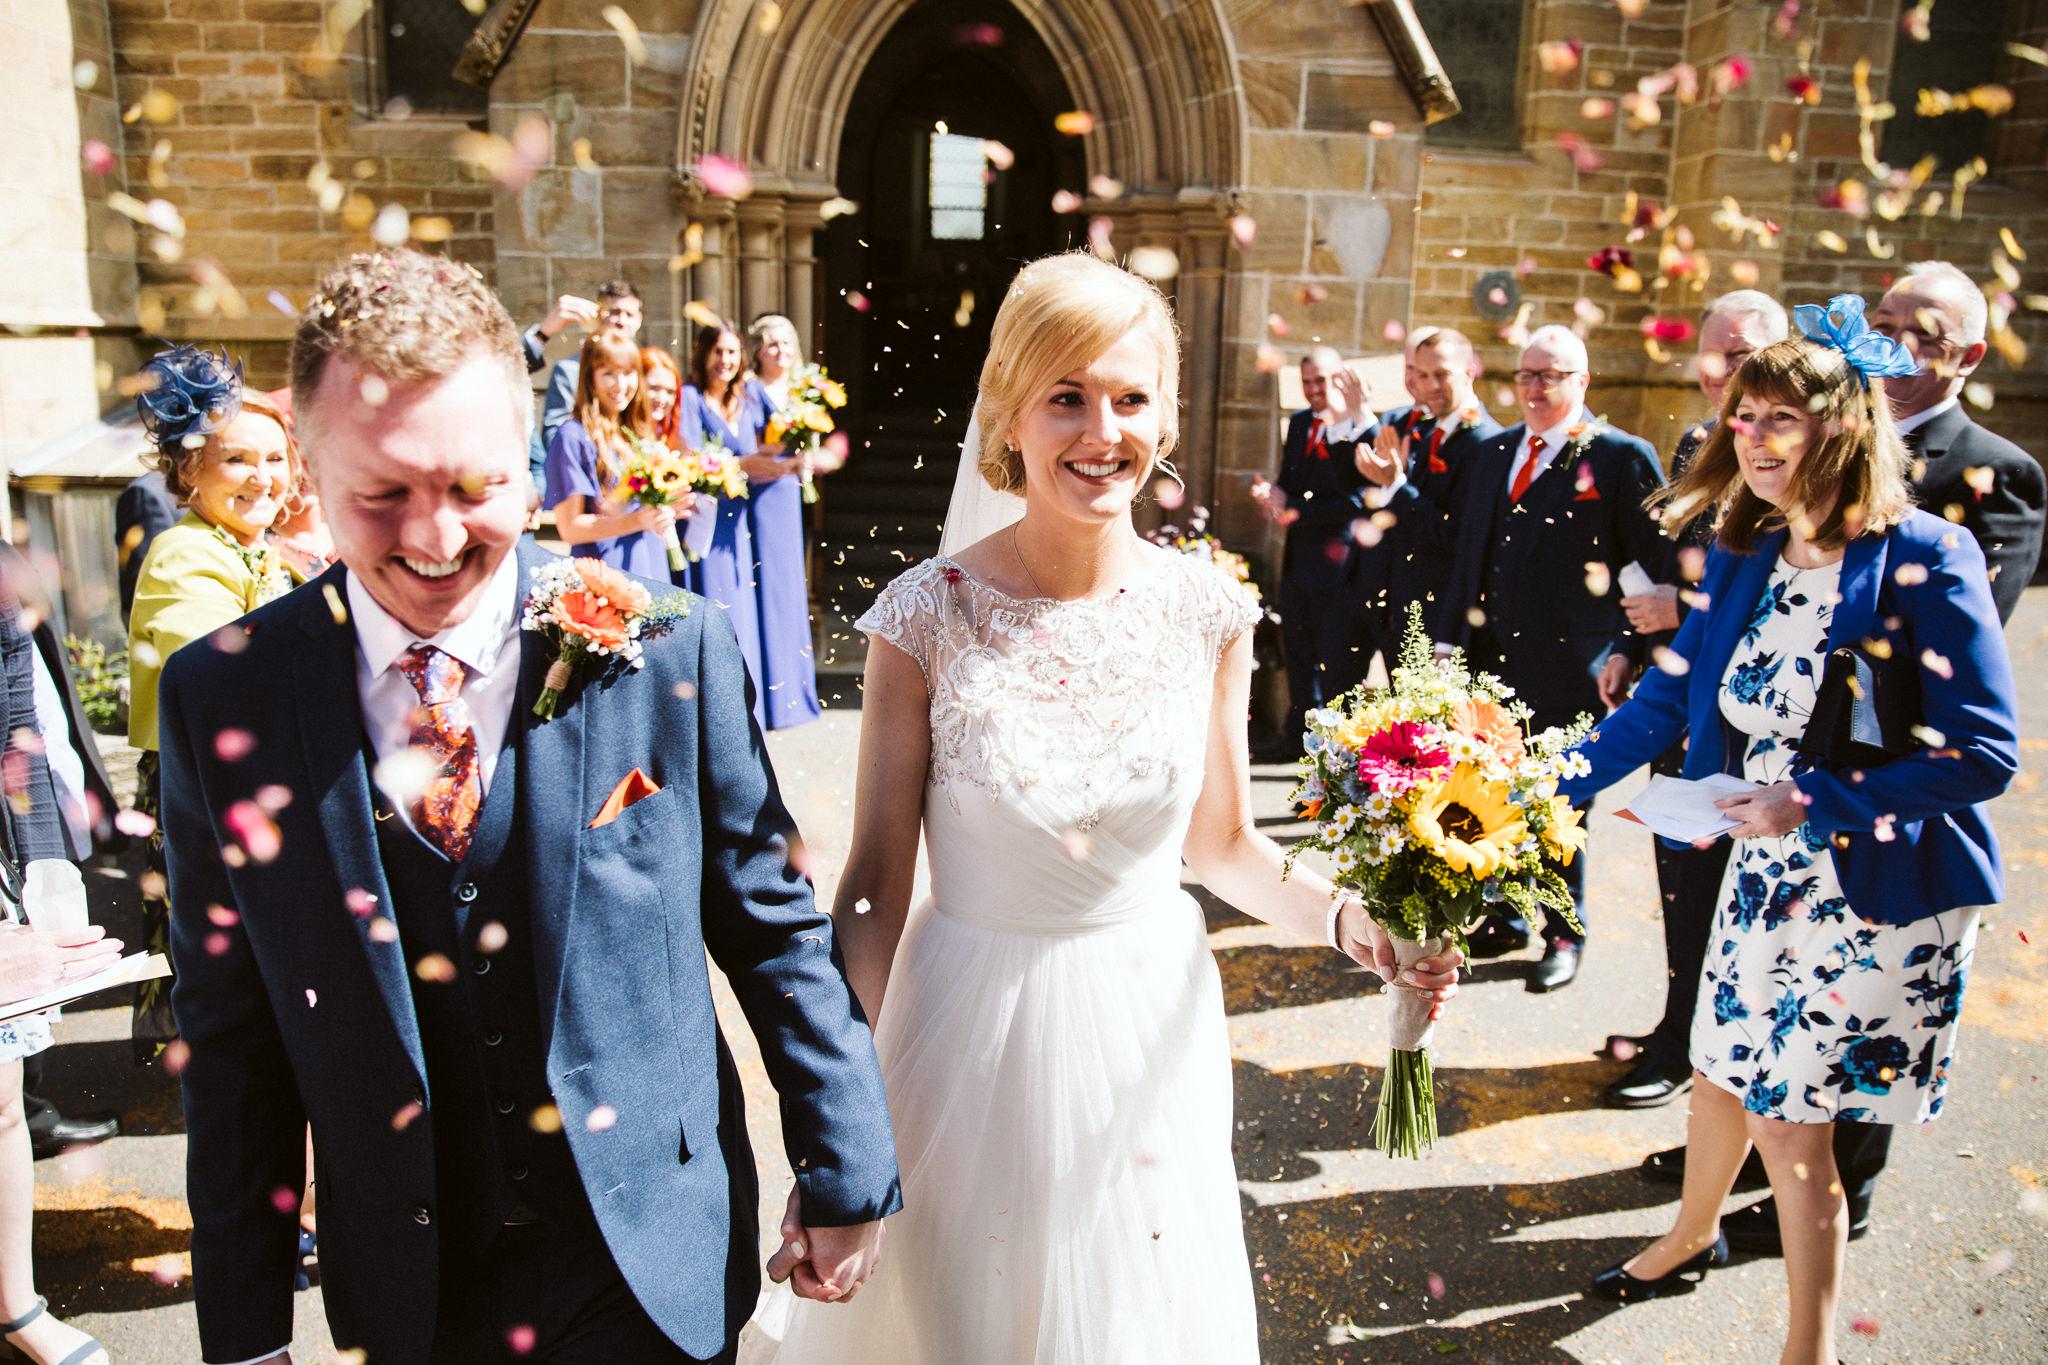 northside-farm-wedding-northumberland-margarita-hope (34).jpg